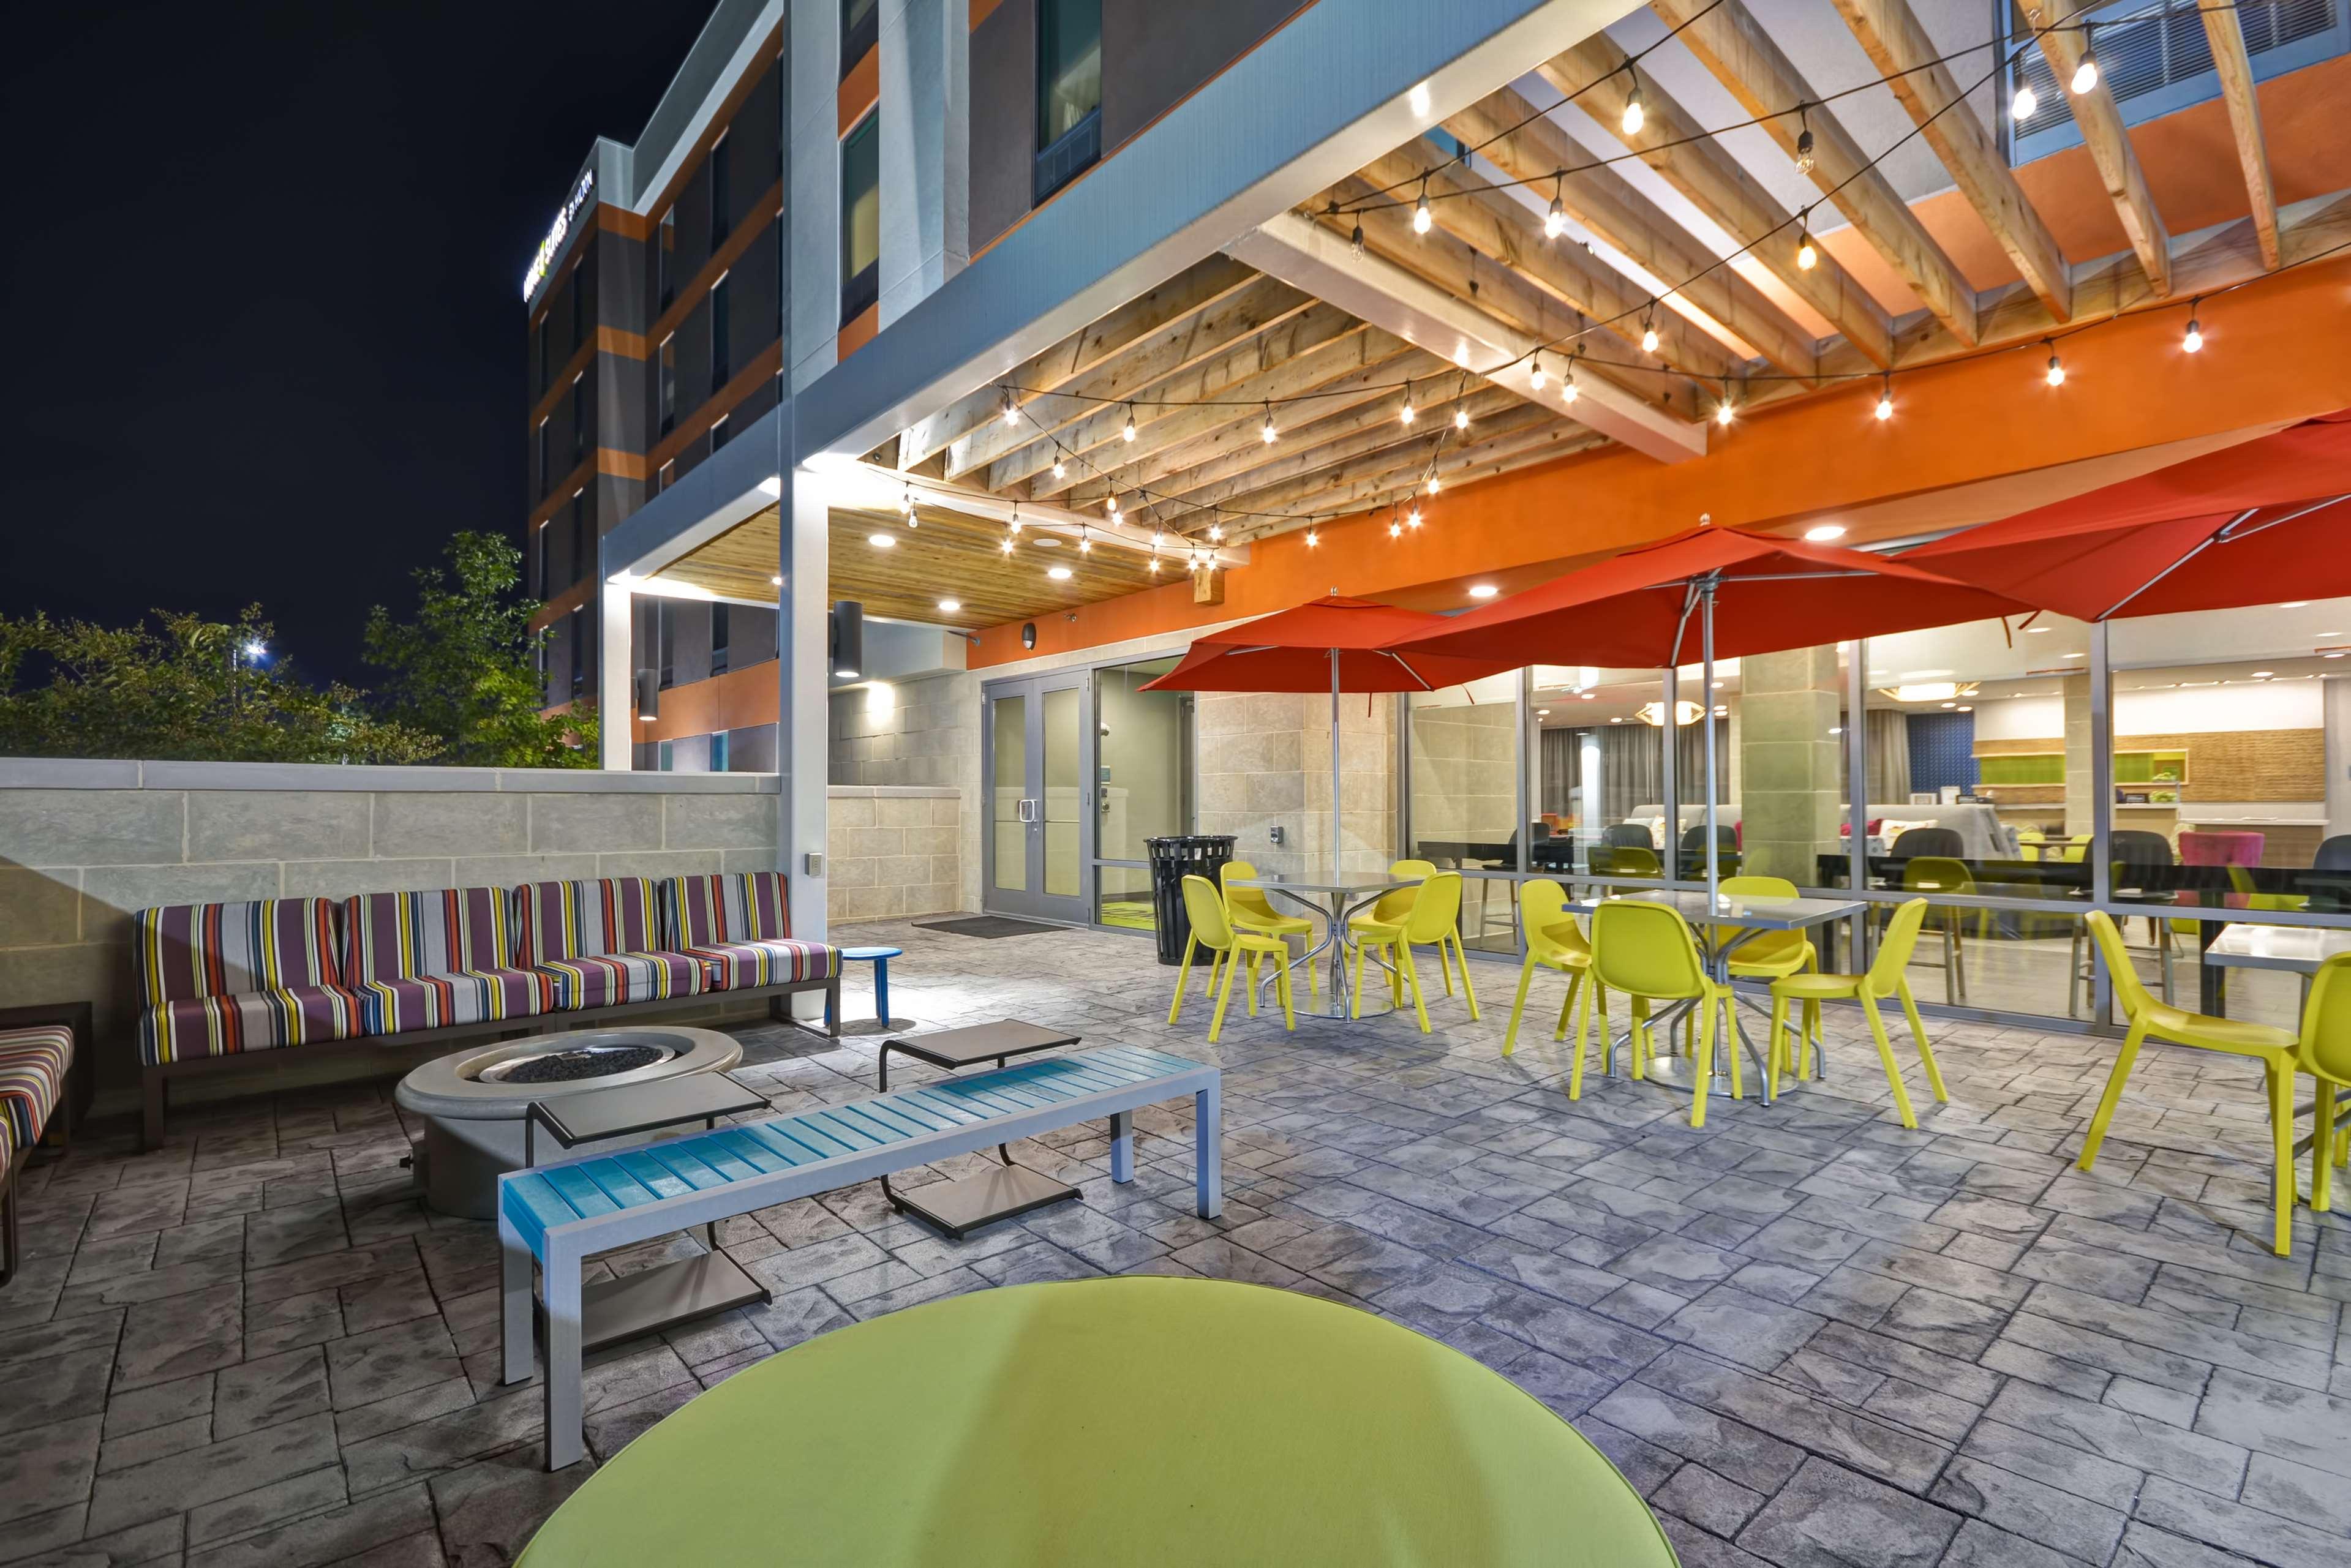 Home2 Suites by Hilton Atlanta West Lithia Springs image 8